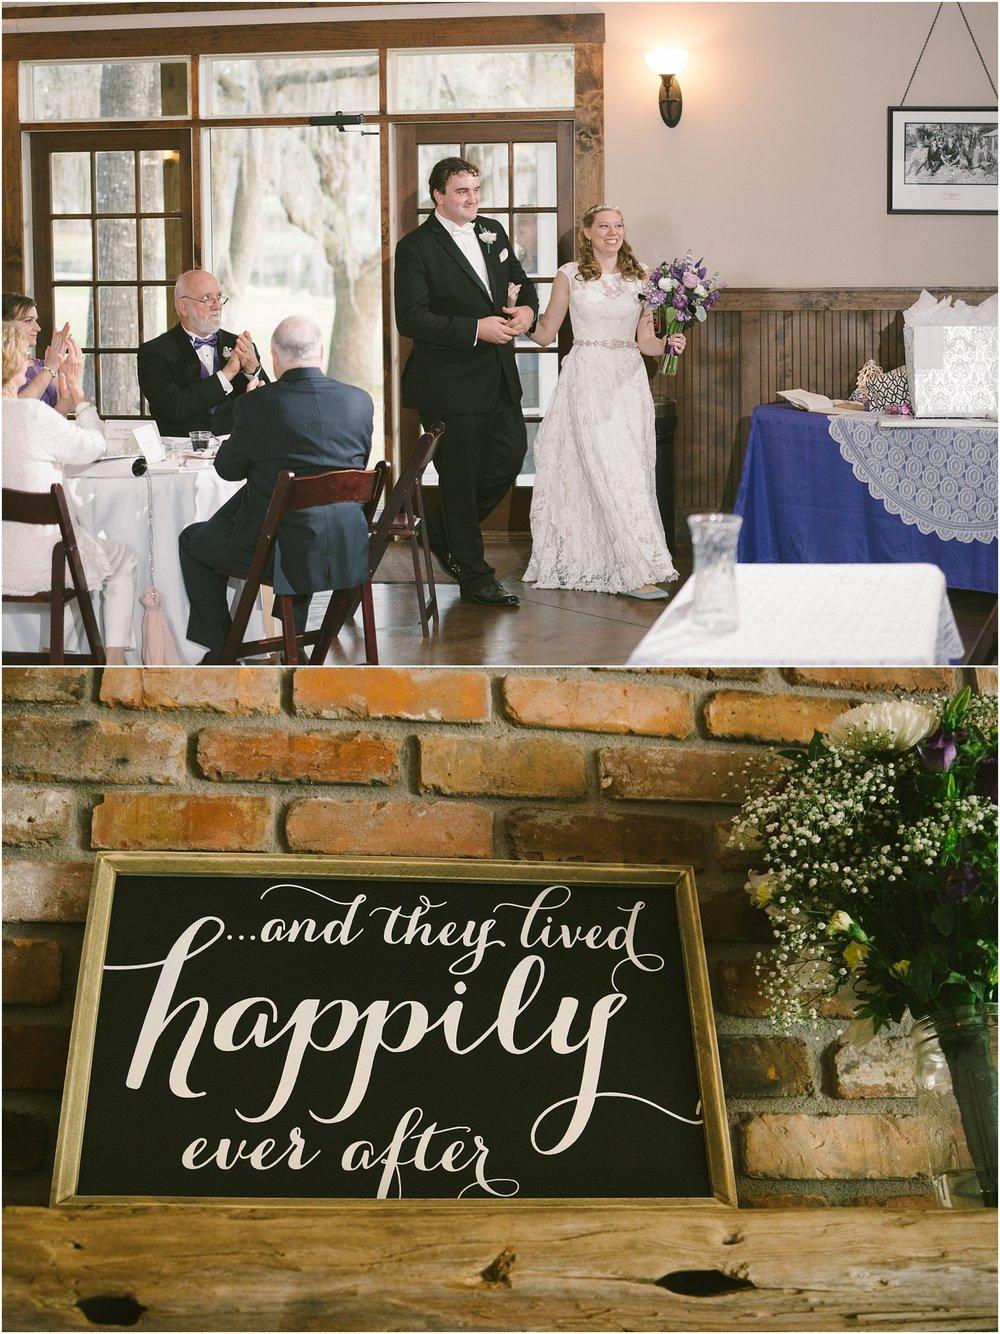 bradleys-pond-tallahassee-wedding-March-2017_0060.jpg